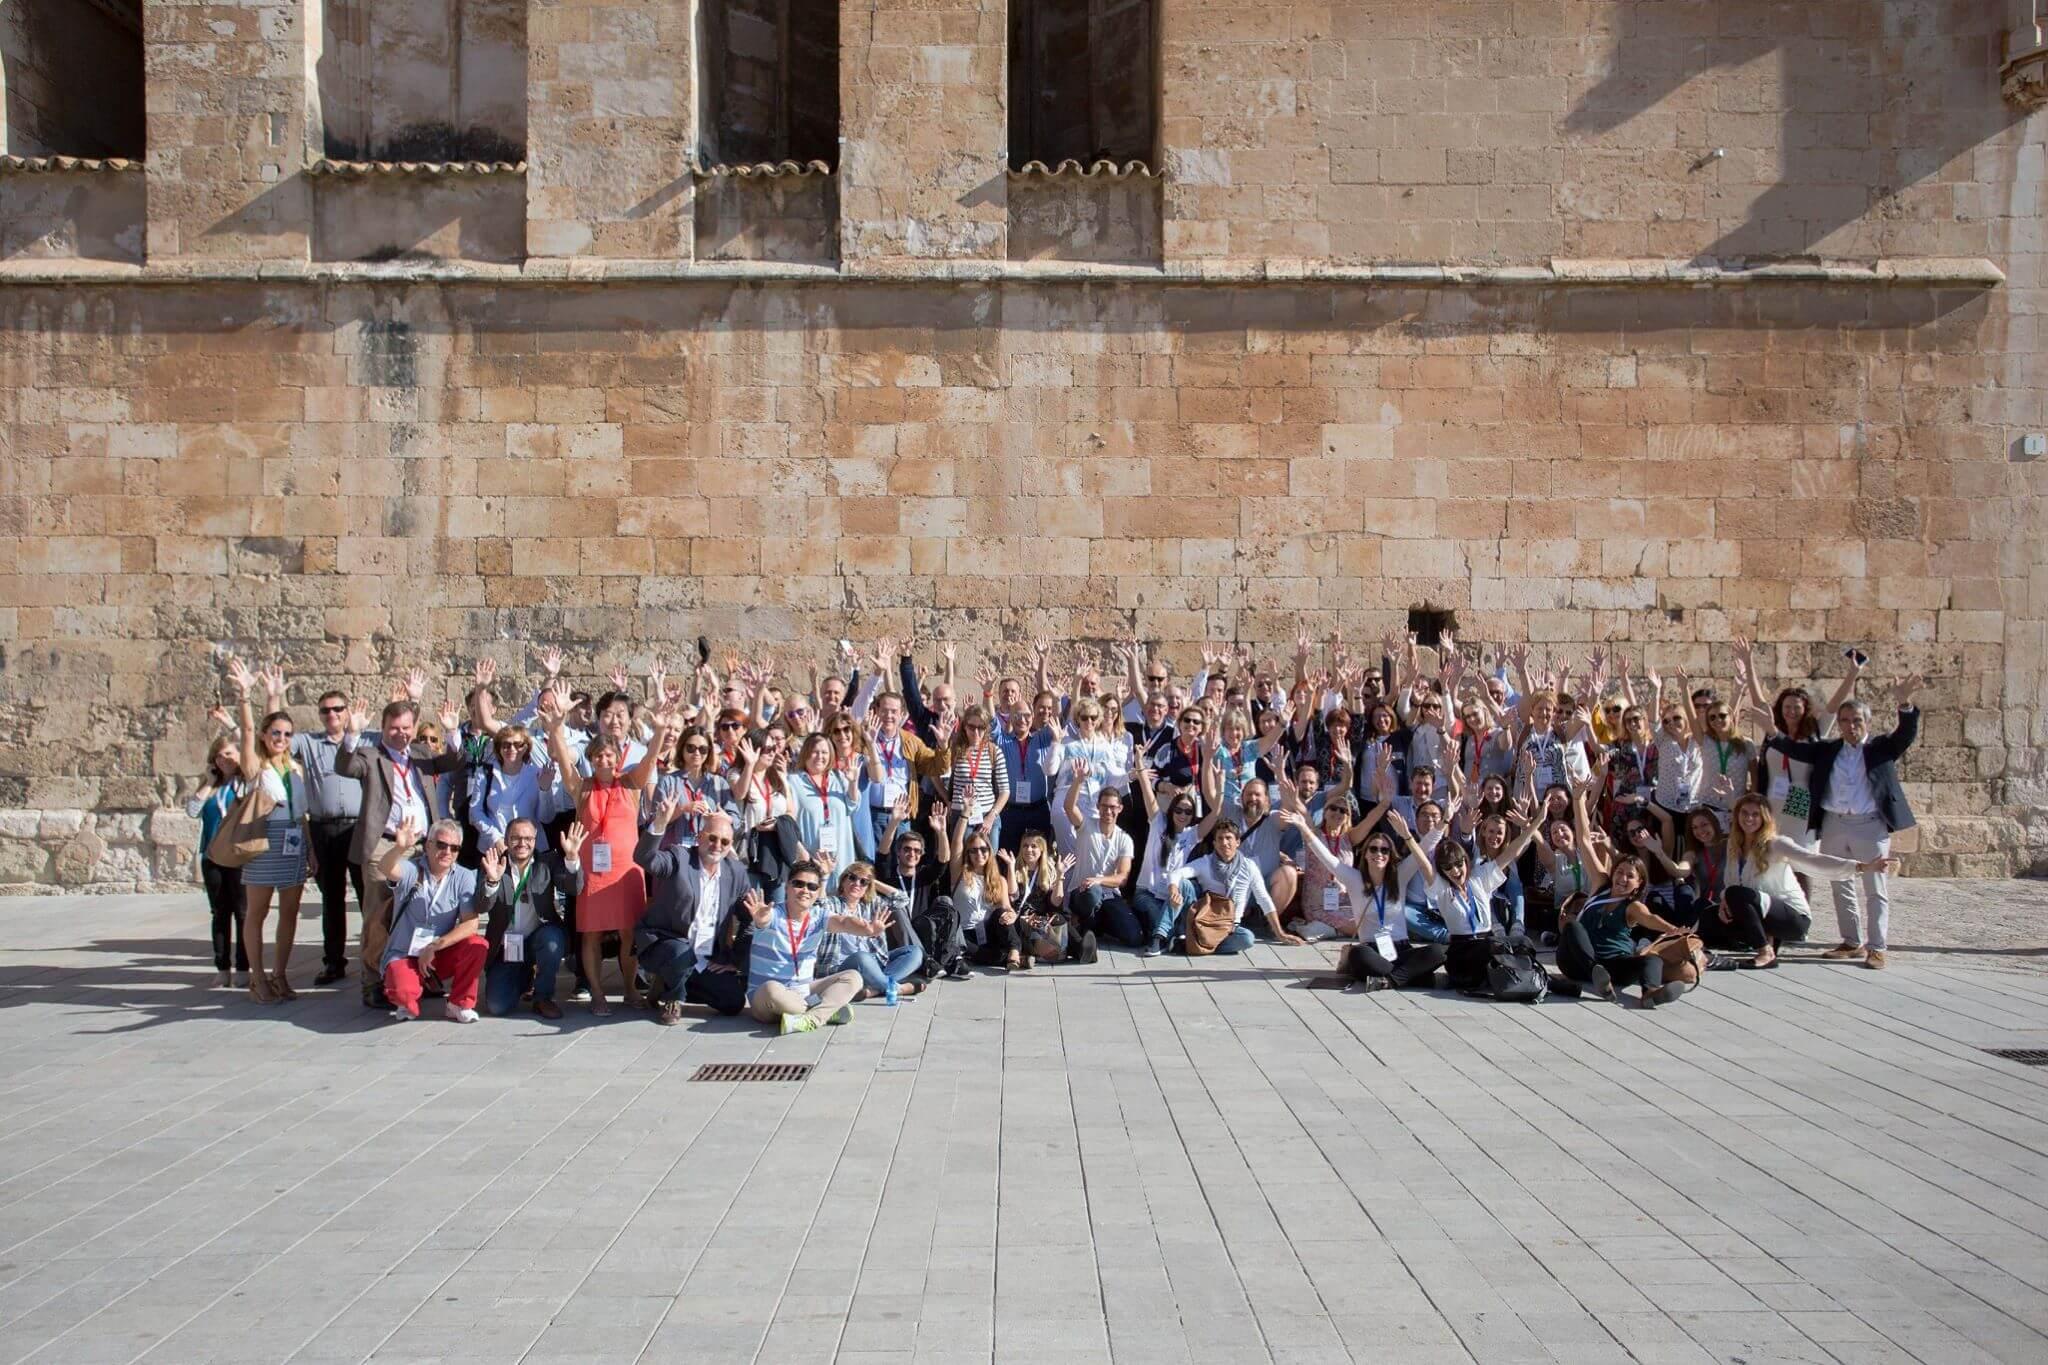 2017 – Ibiza y Palma – ¡Vamos!